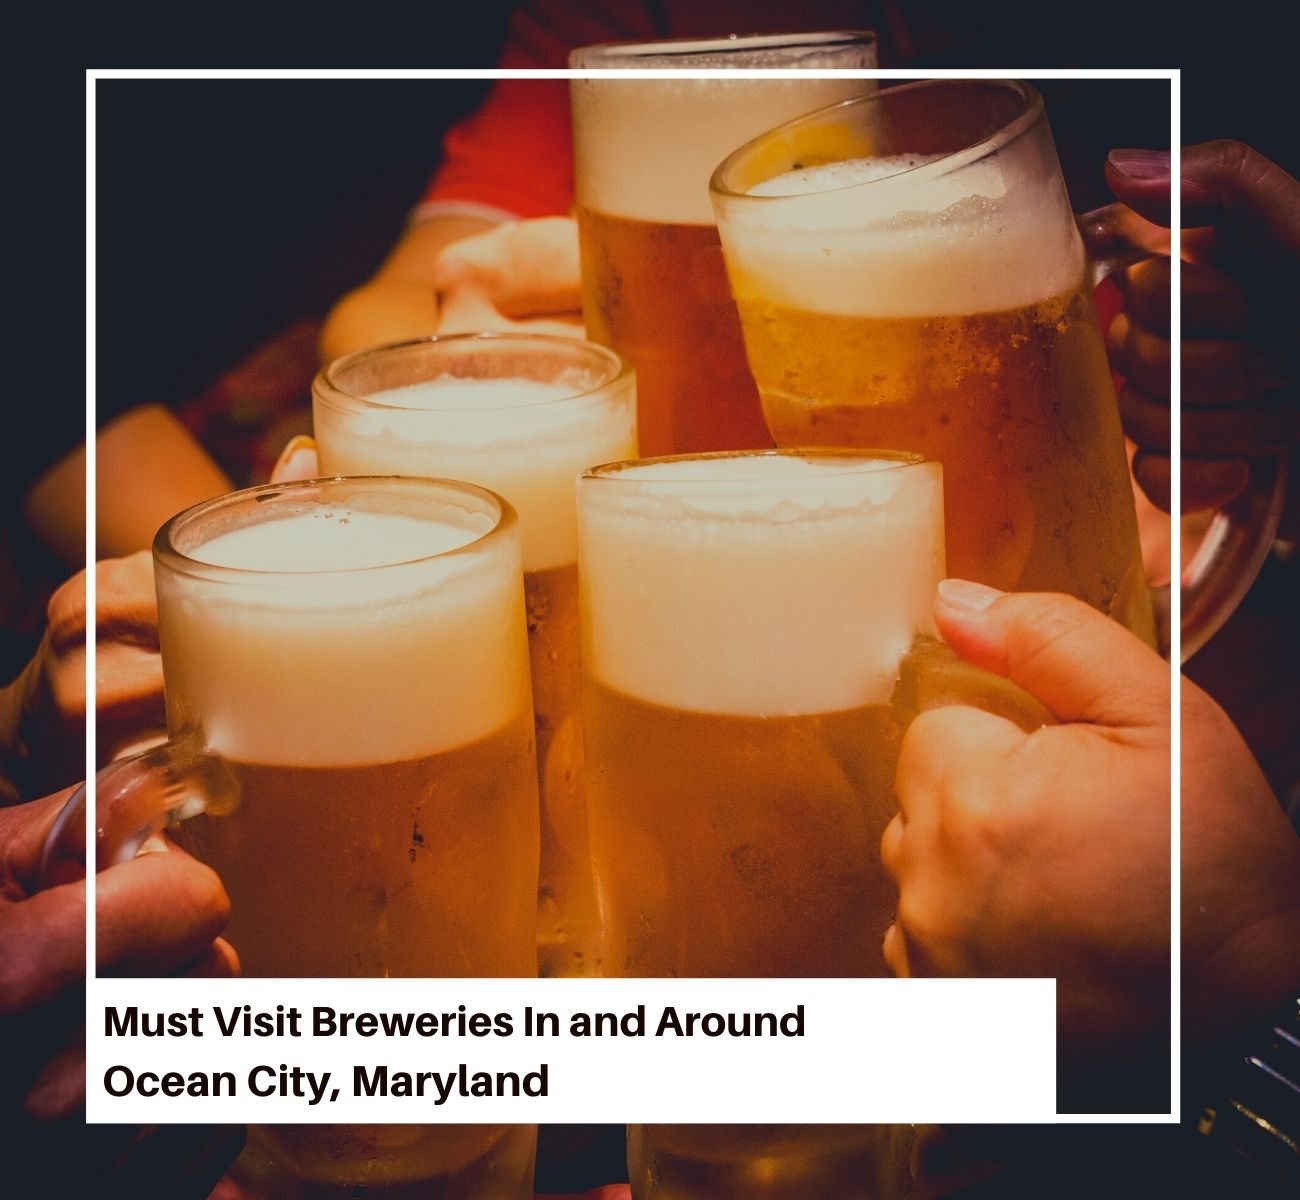 Ocean City Maryland Brewery Friends Cheering